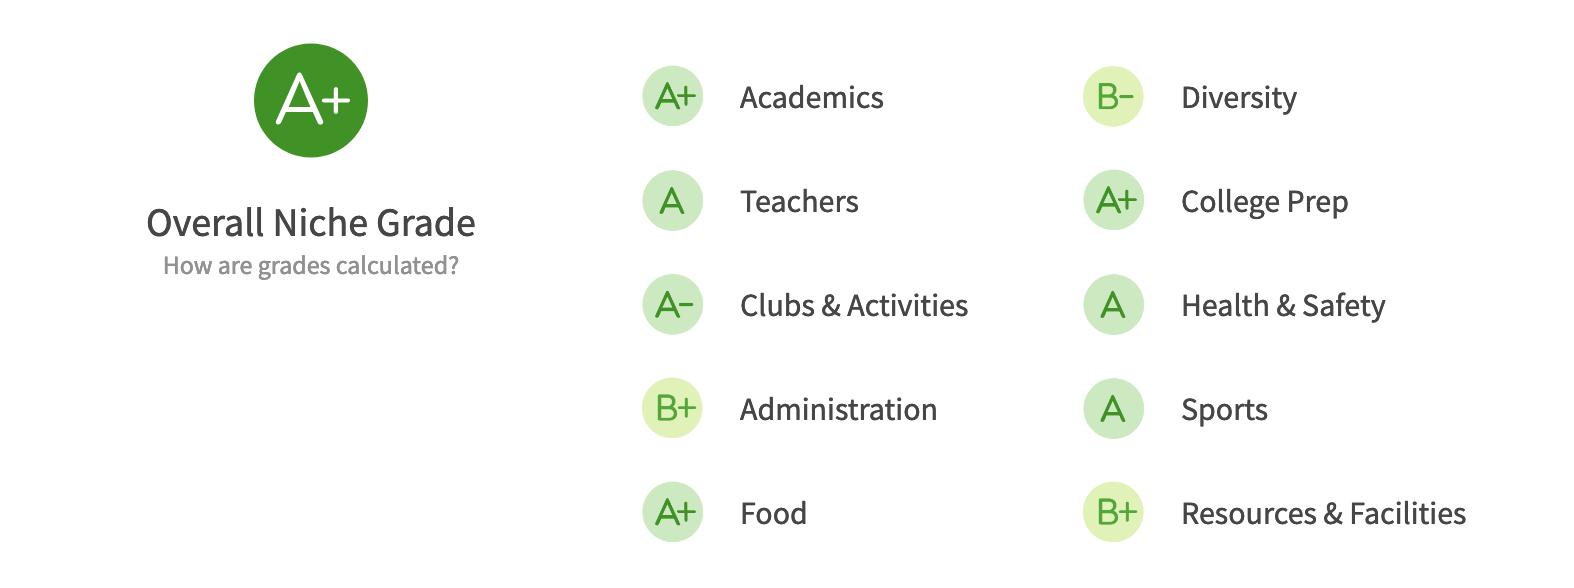 Seattle Public Schools Districts Mercer Island niche.com grades